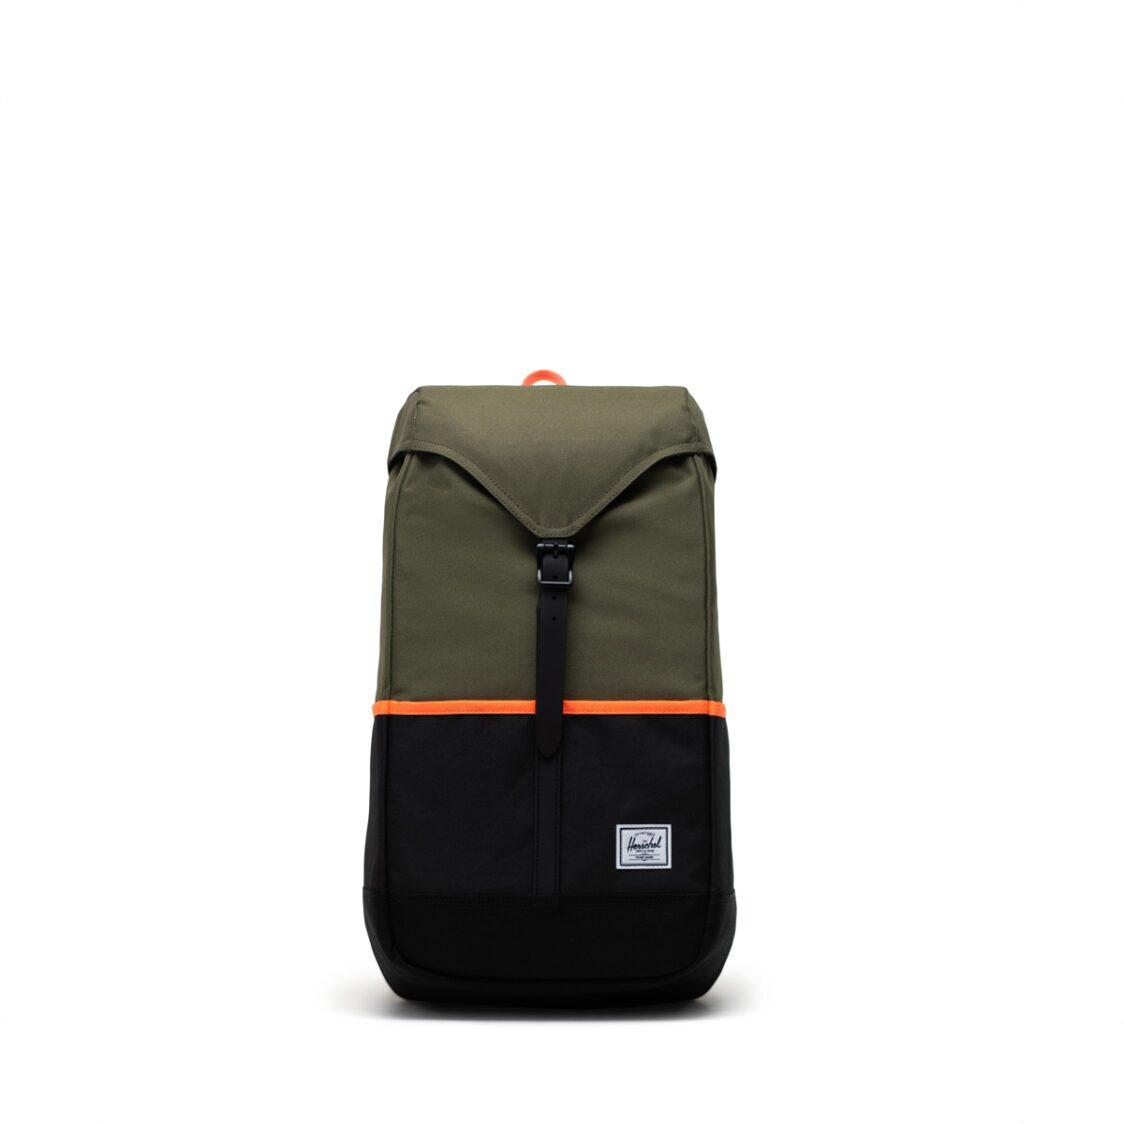 Herschel Thompson Pro Ivy GreenBlackShocking Orange Backpack 11041-04940-OS